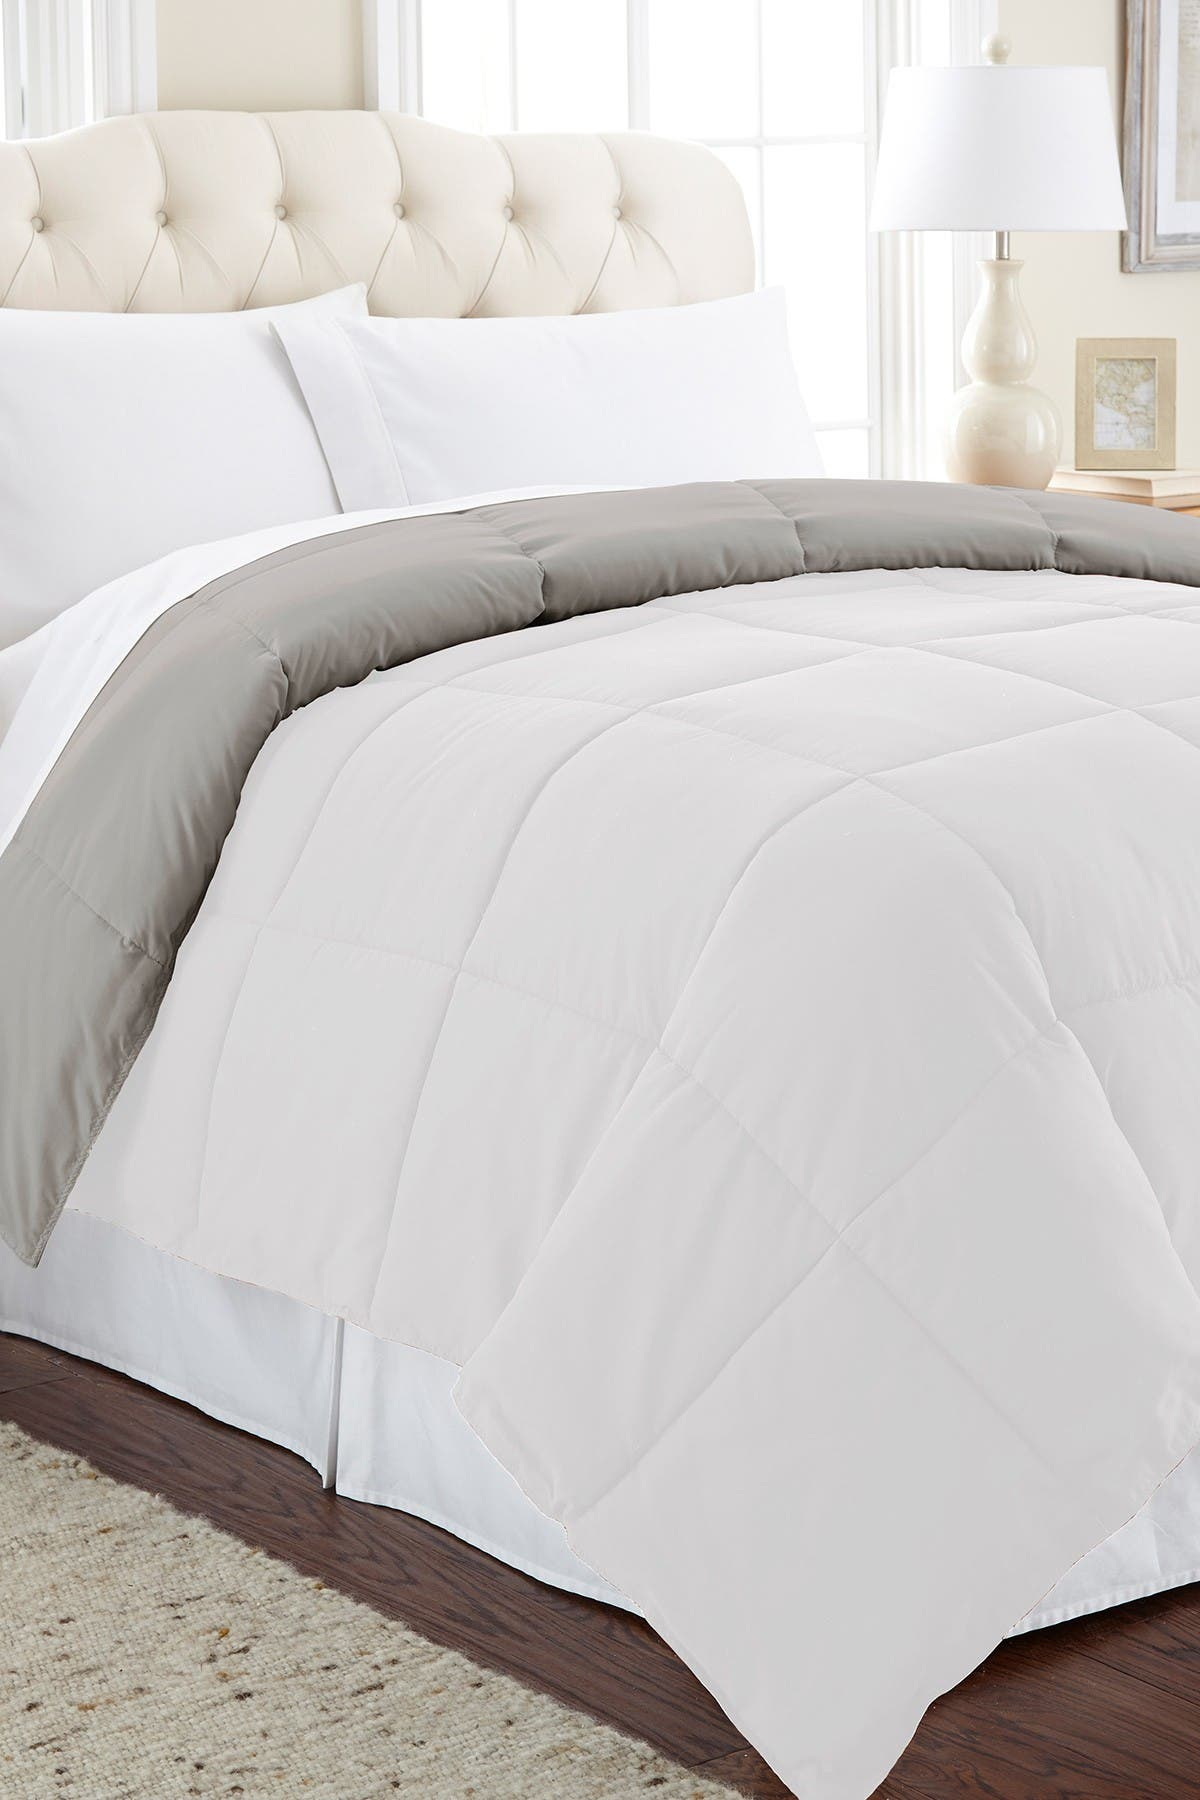 Image of Modern Threads Twin Down Alternative Reversible Comforter - White/Grey